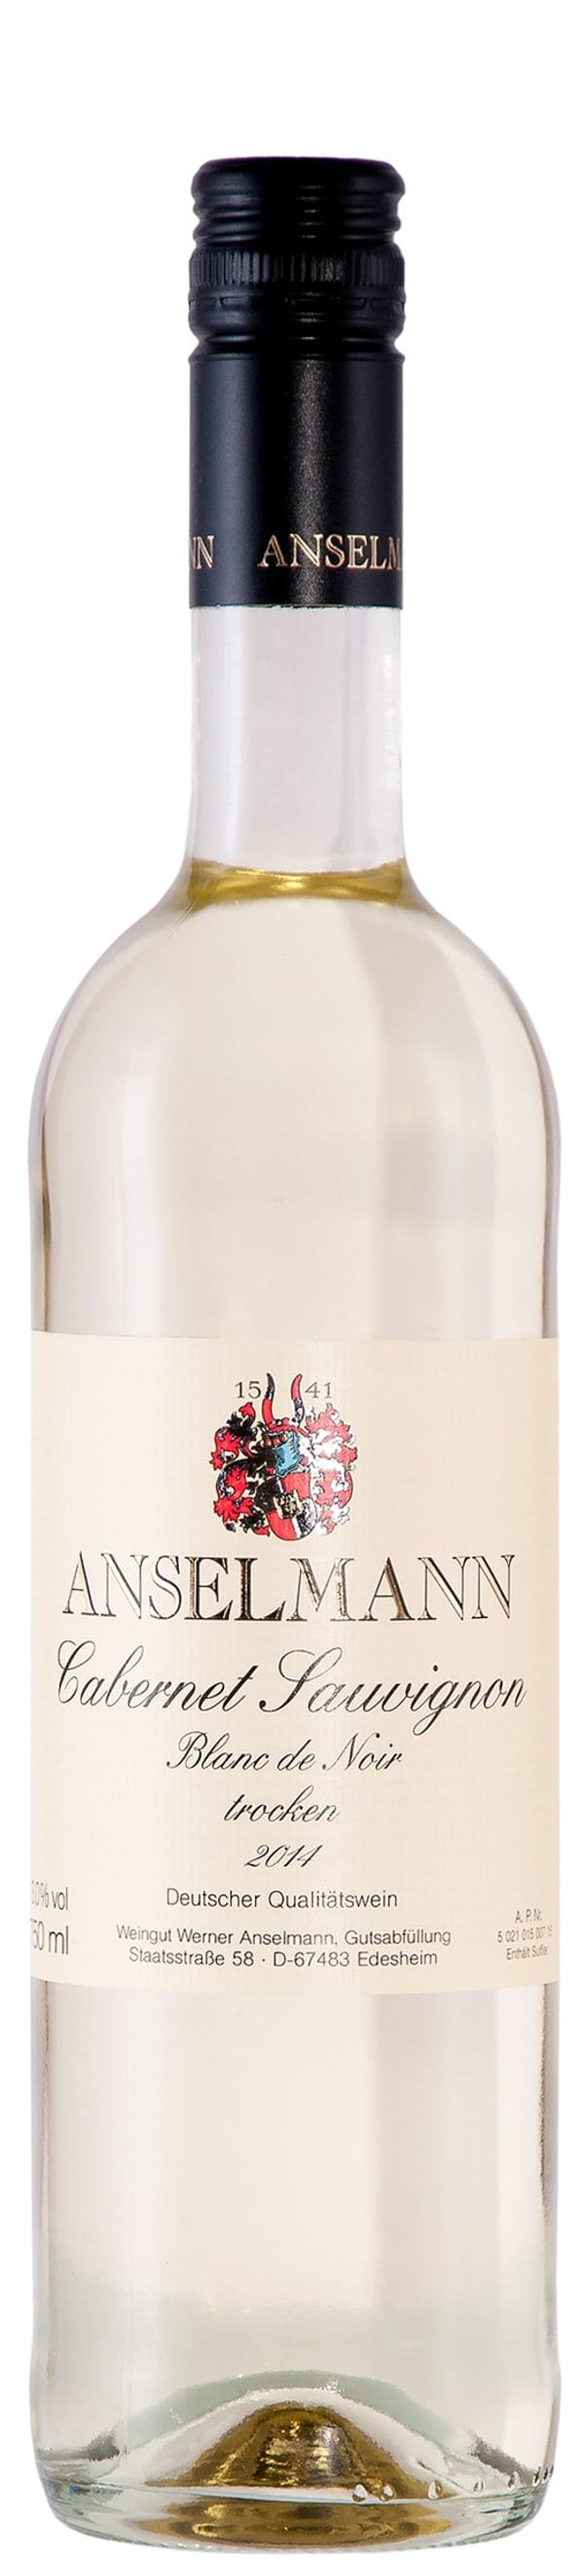 Anselmann Cabernet Sauvignon Blanc de Noir 2017